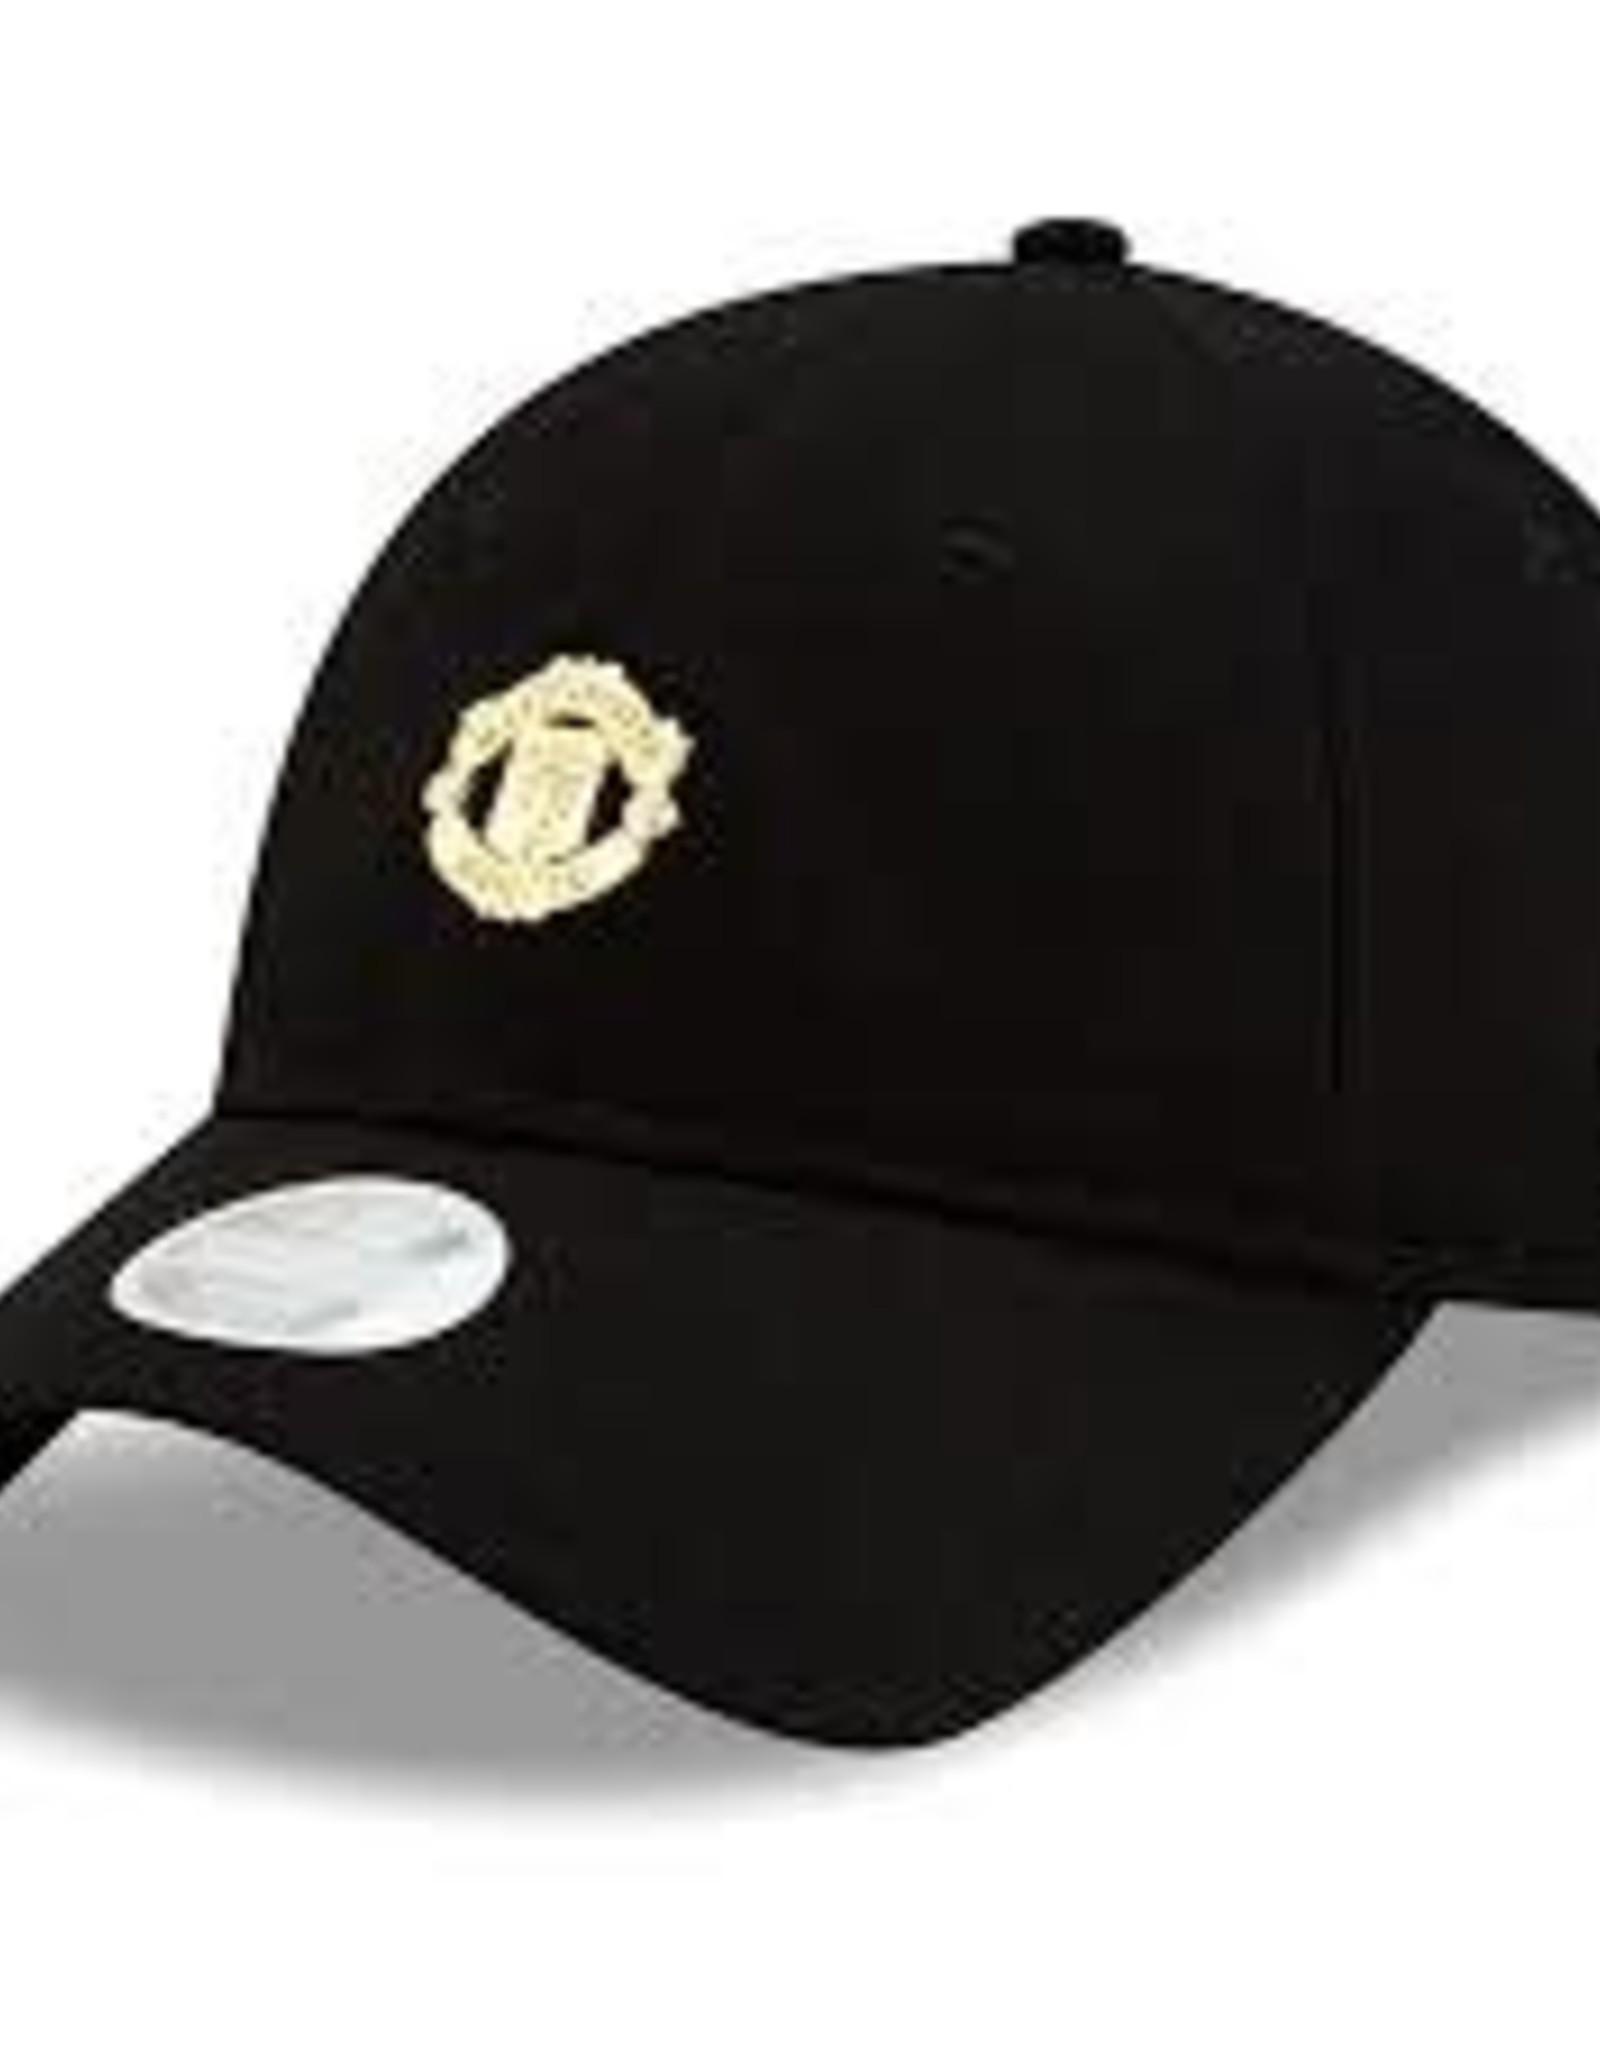 Manchester United Black Crest Hat